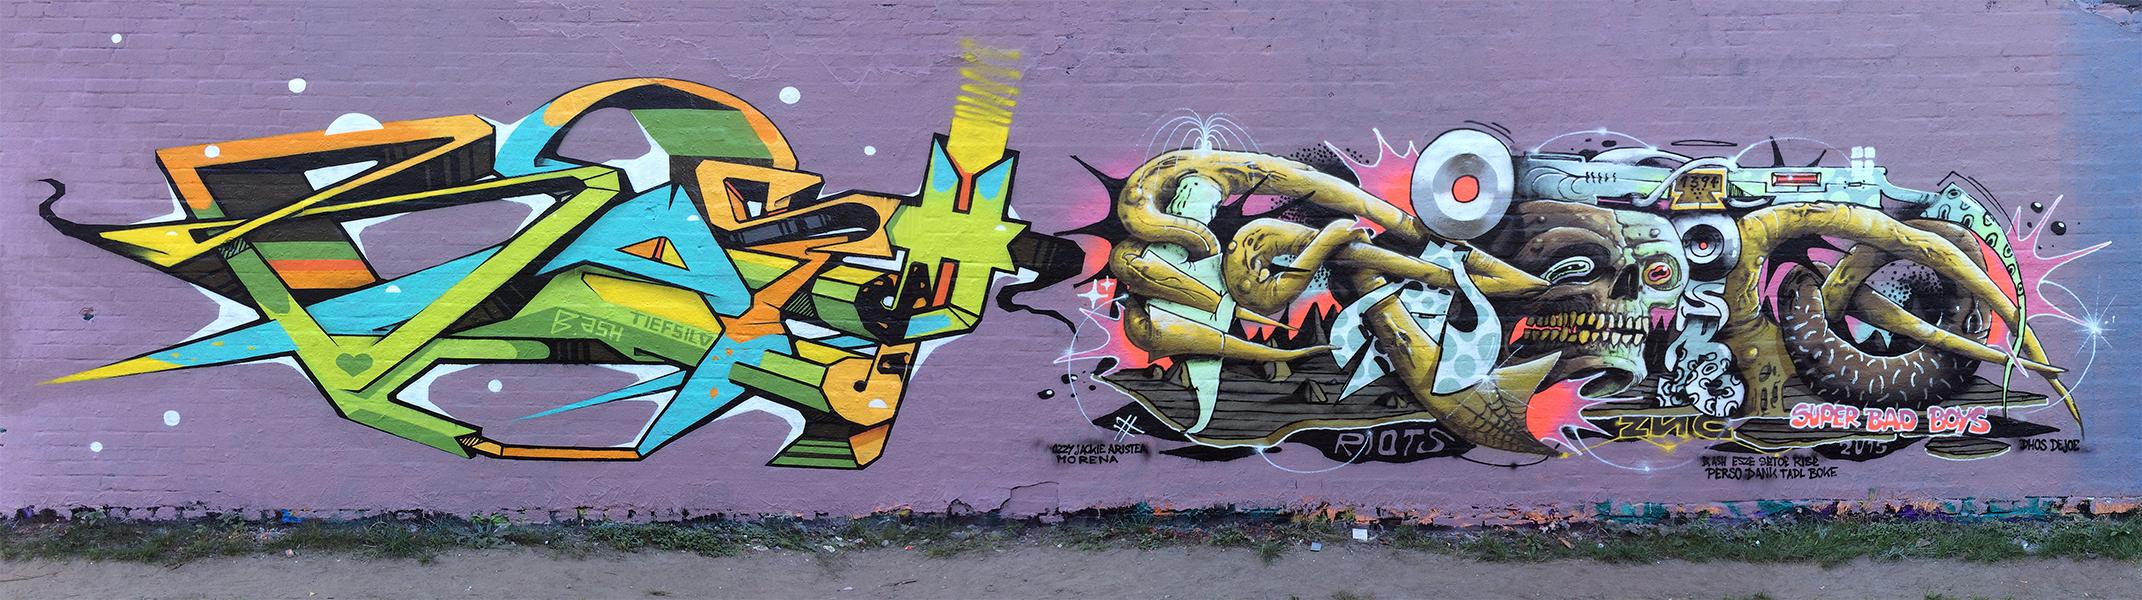 B.ash+Riots_Rummelsburg_Berlin_2015_web